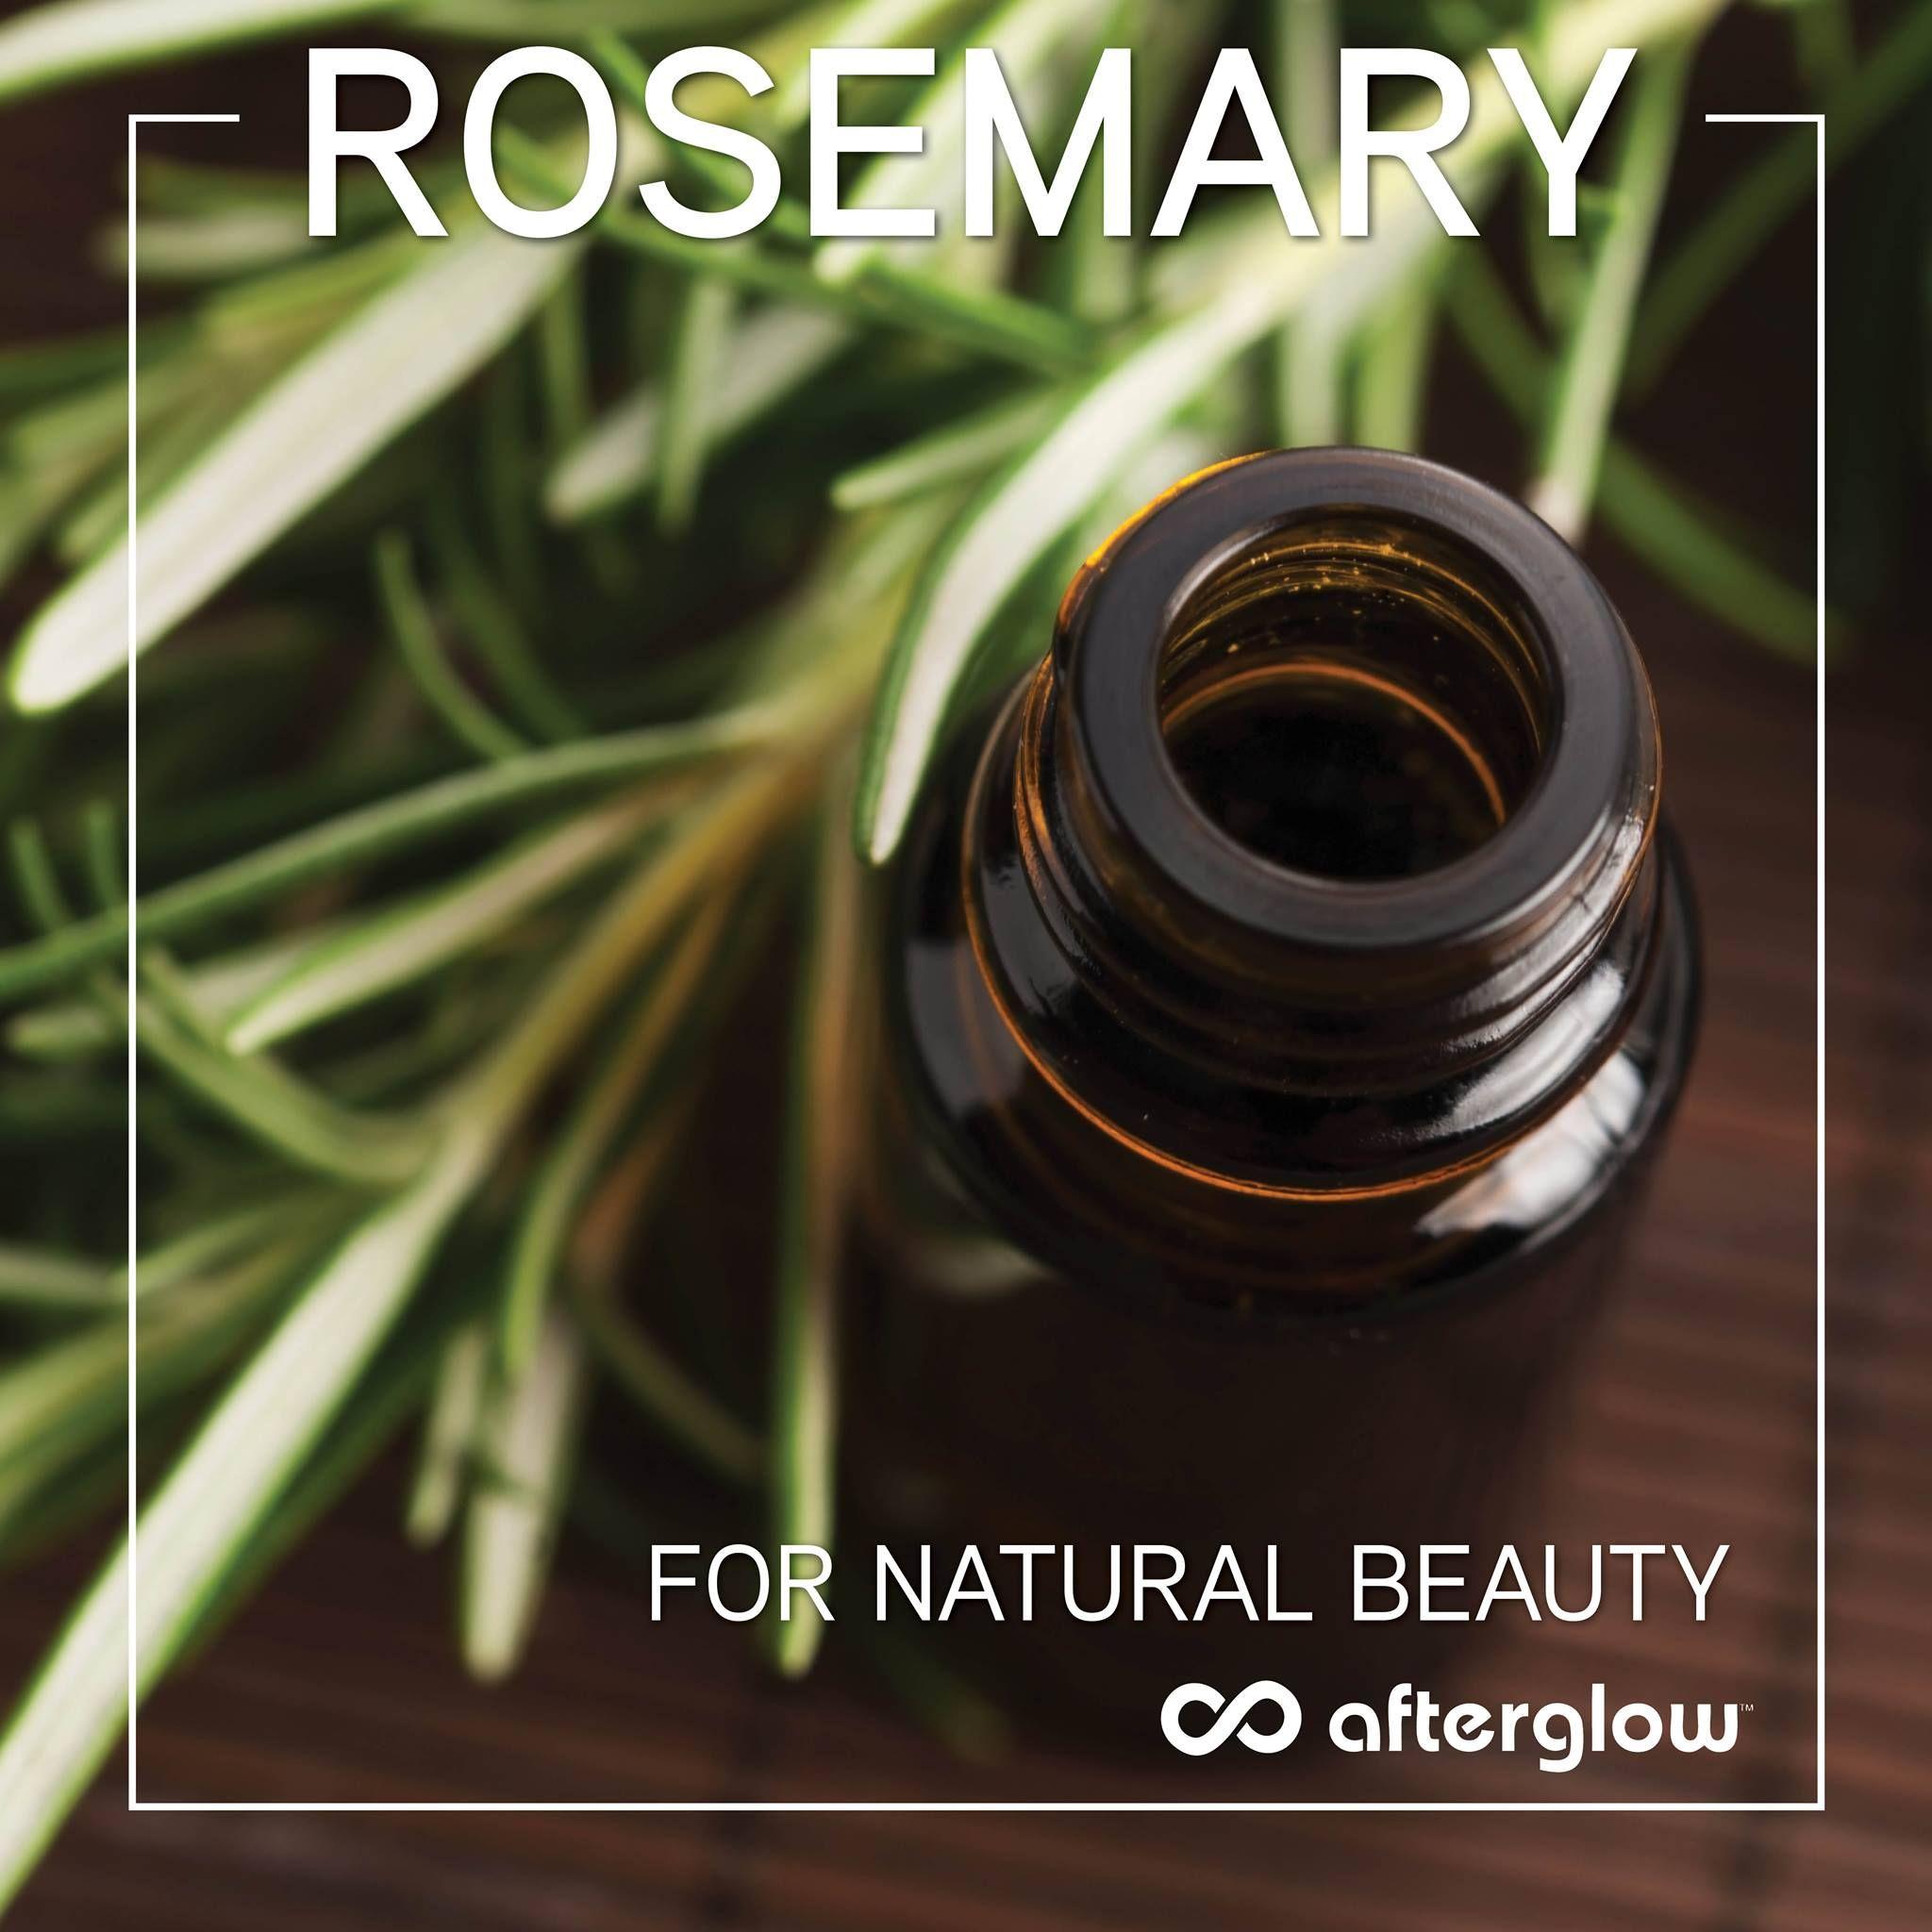 Rosemary for #NaturalBeauty!  #GlutenFree #AllNatural #Health #Wellness #CrueltyFree #Cosmetics #AfterglowCosmetics #Insideoutbeauty #NaturalCosmetics